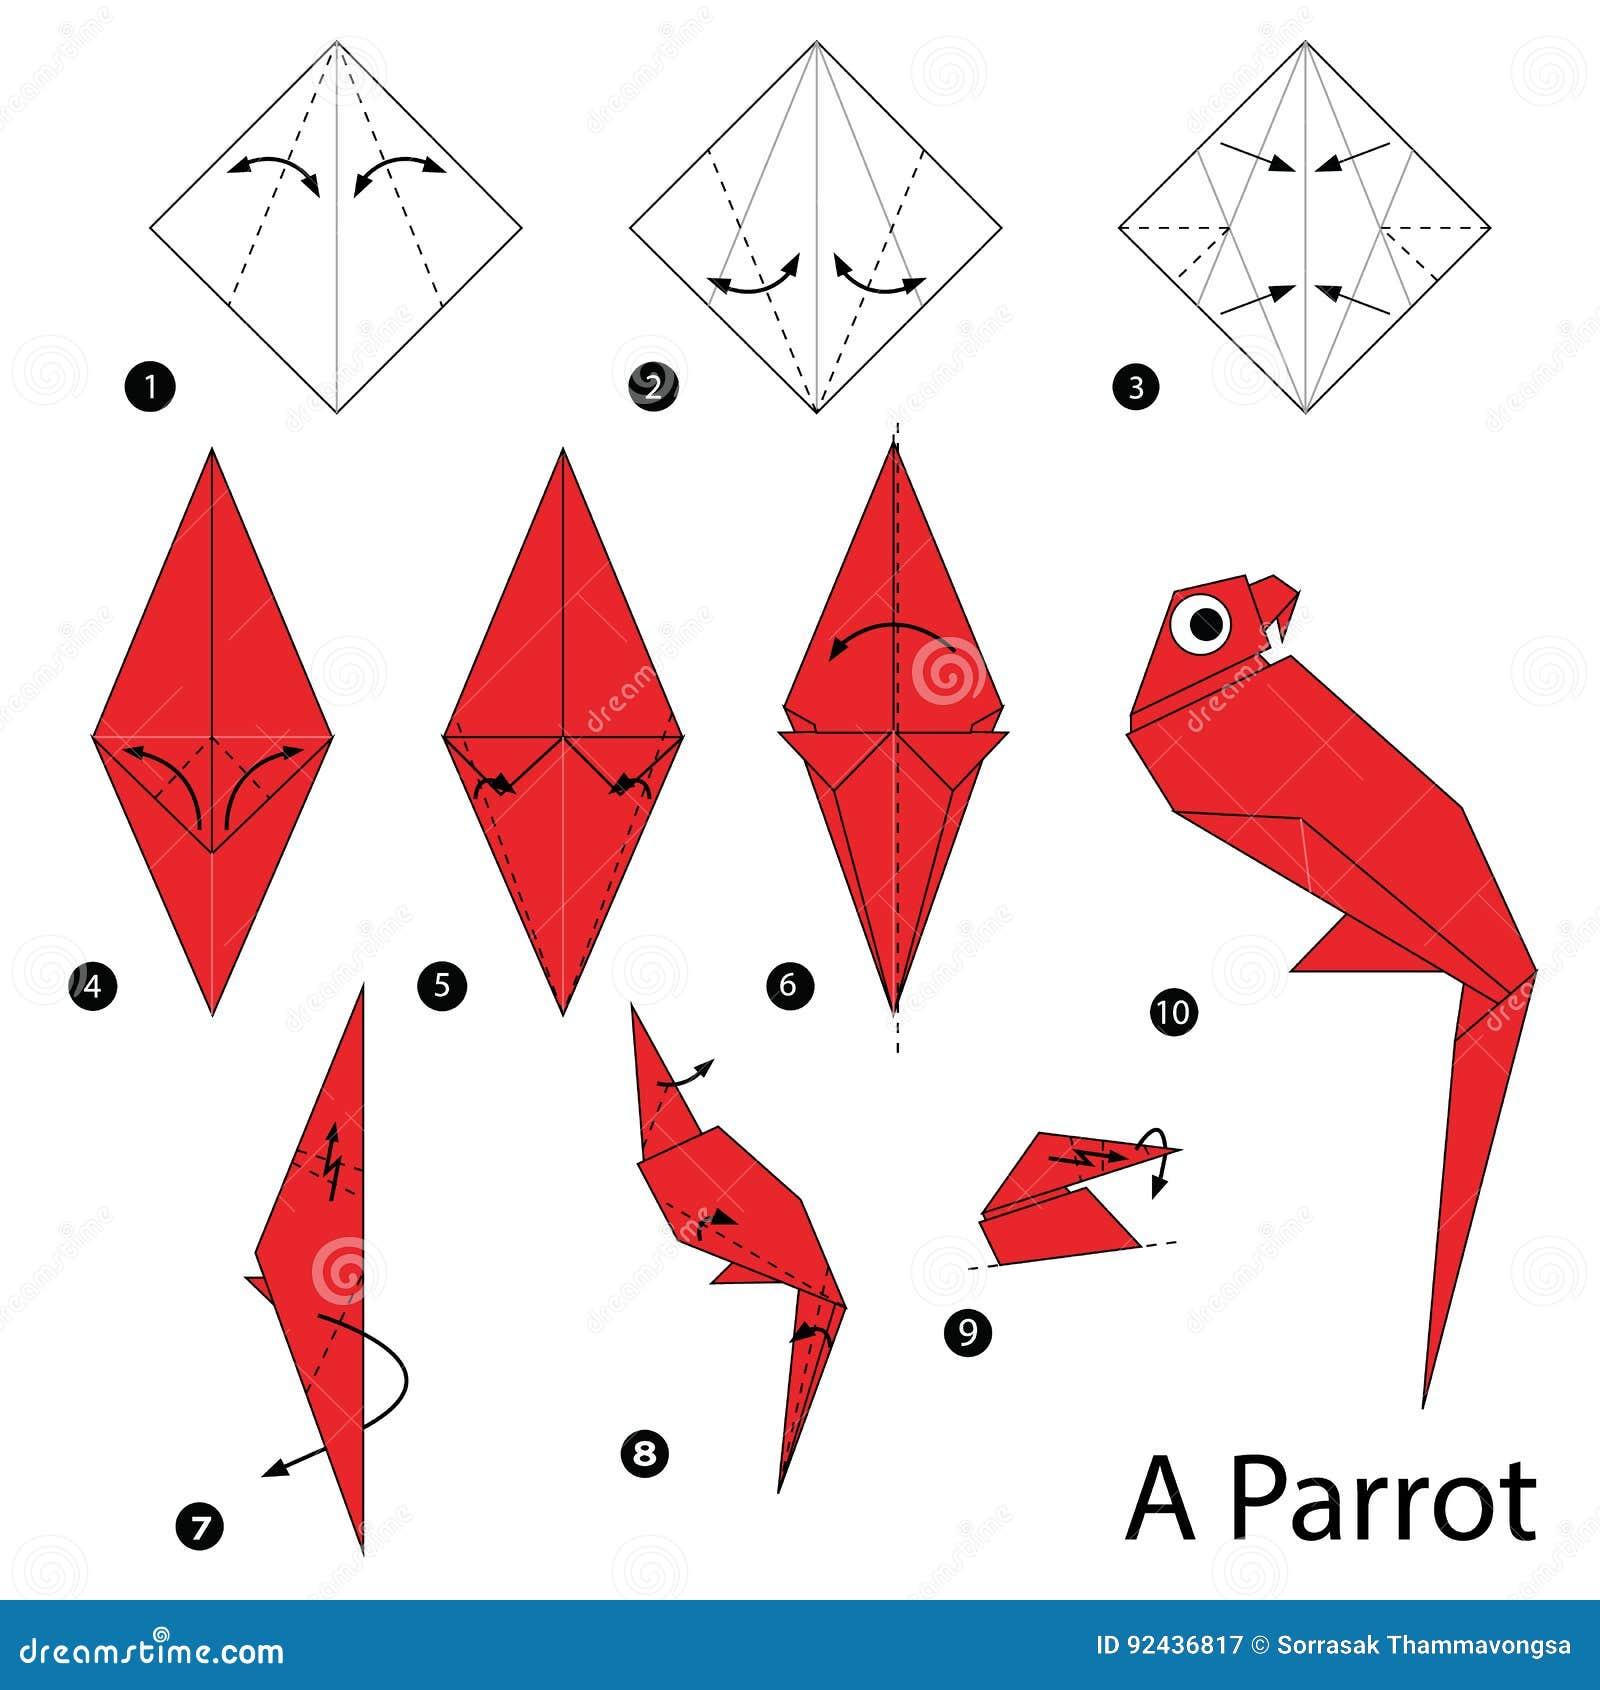 Instrucciones paso a paso c mo hacer papiroflexia un loro - Como hacer un estor enrollable paso a paso ...